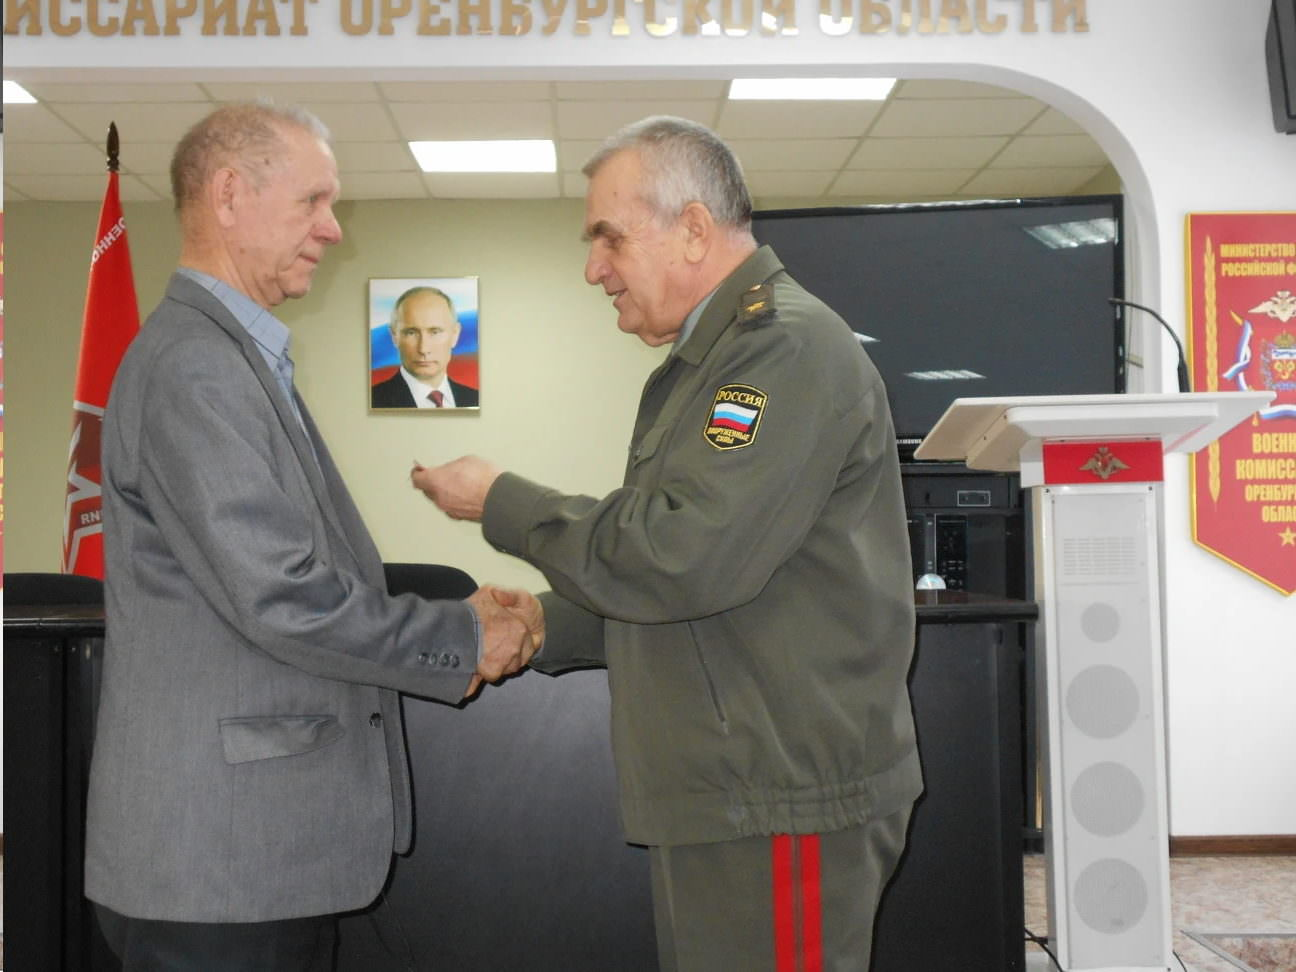 http://cubanos.ru/_data/2019/01/ml01.jpg